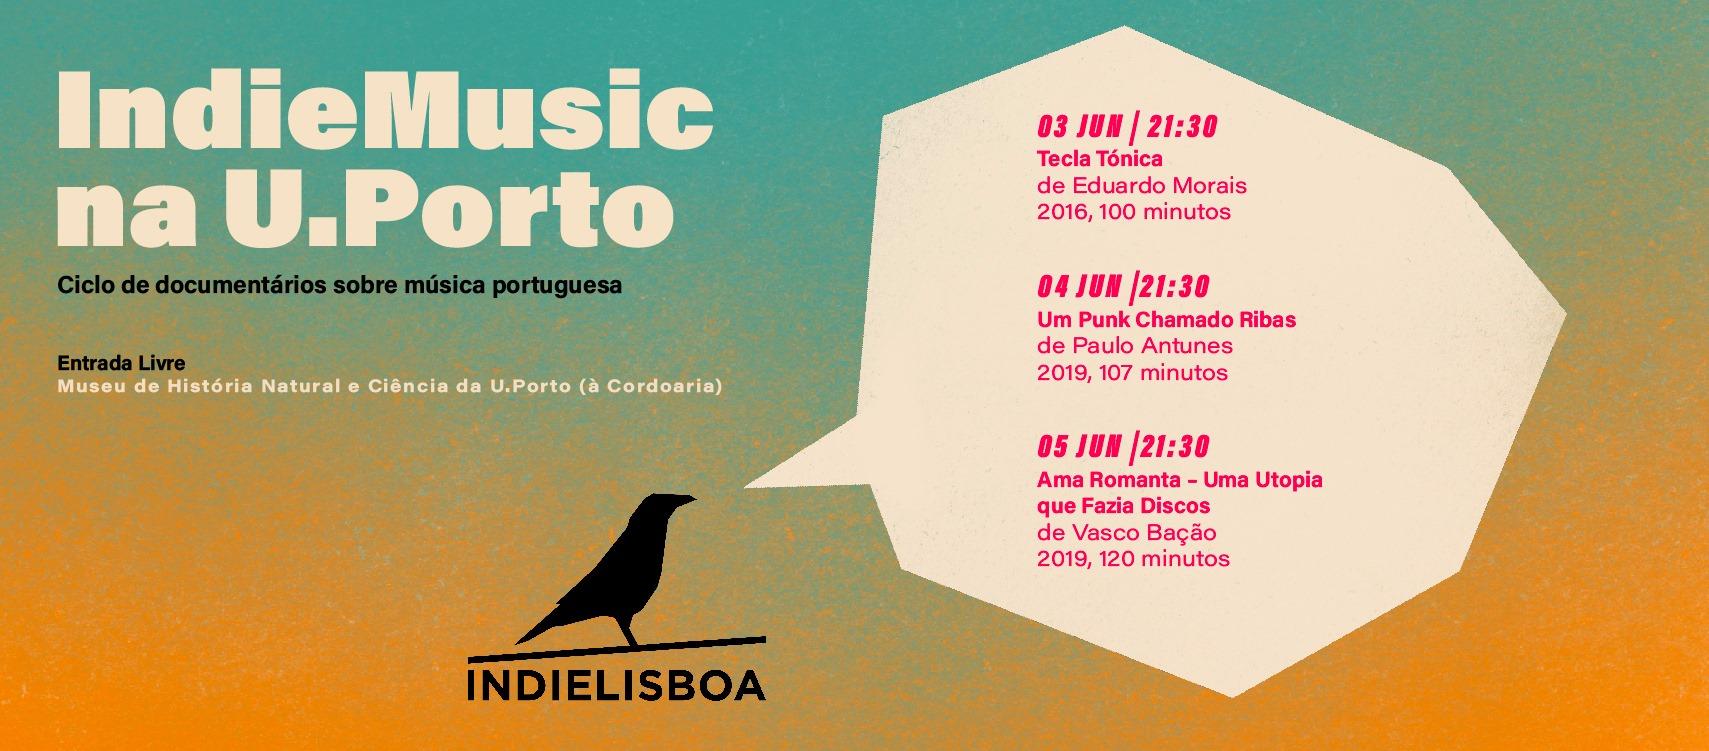 IndieMusic na U.Porto